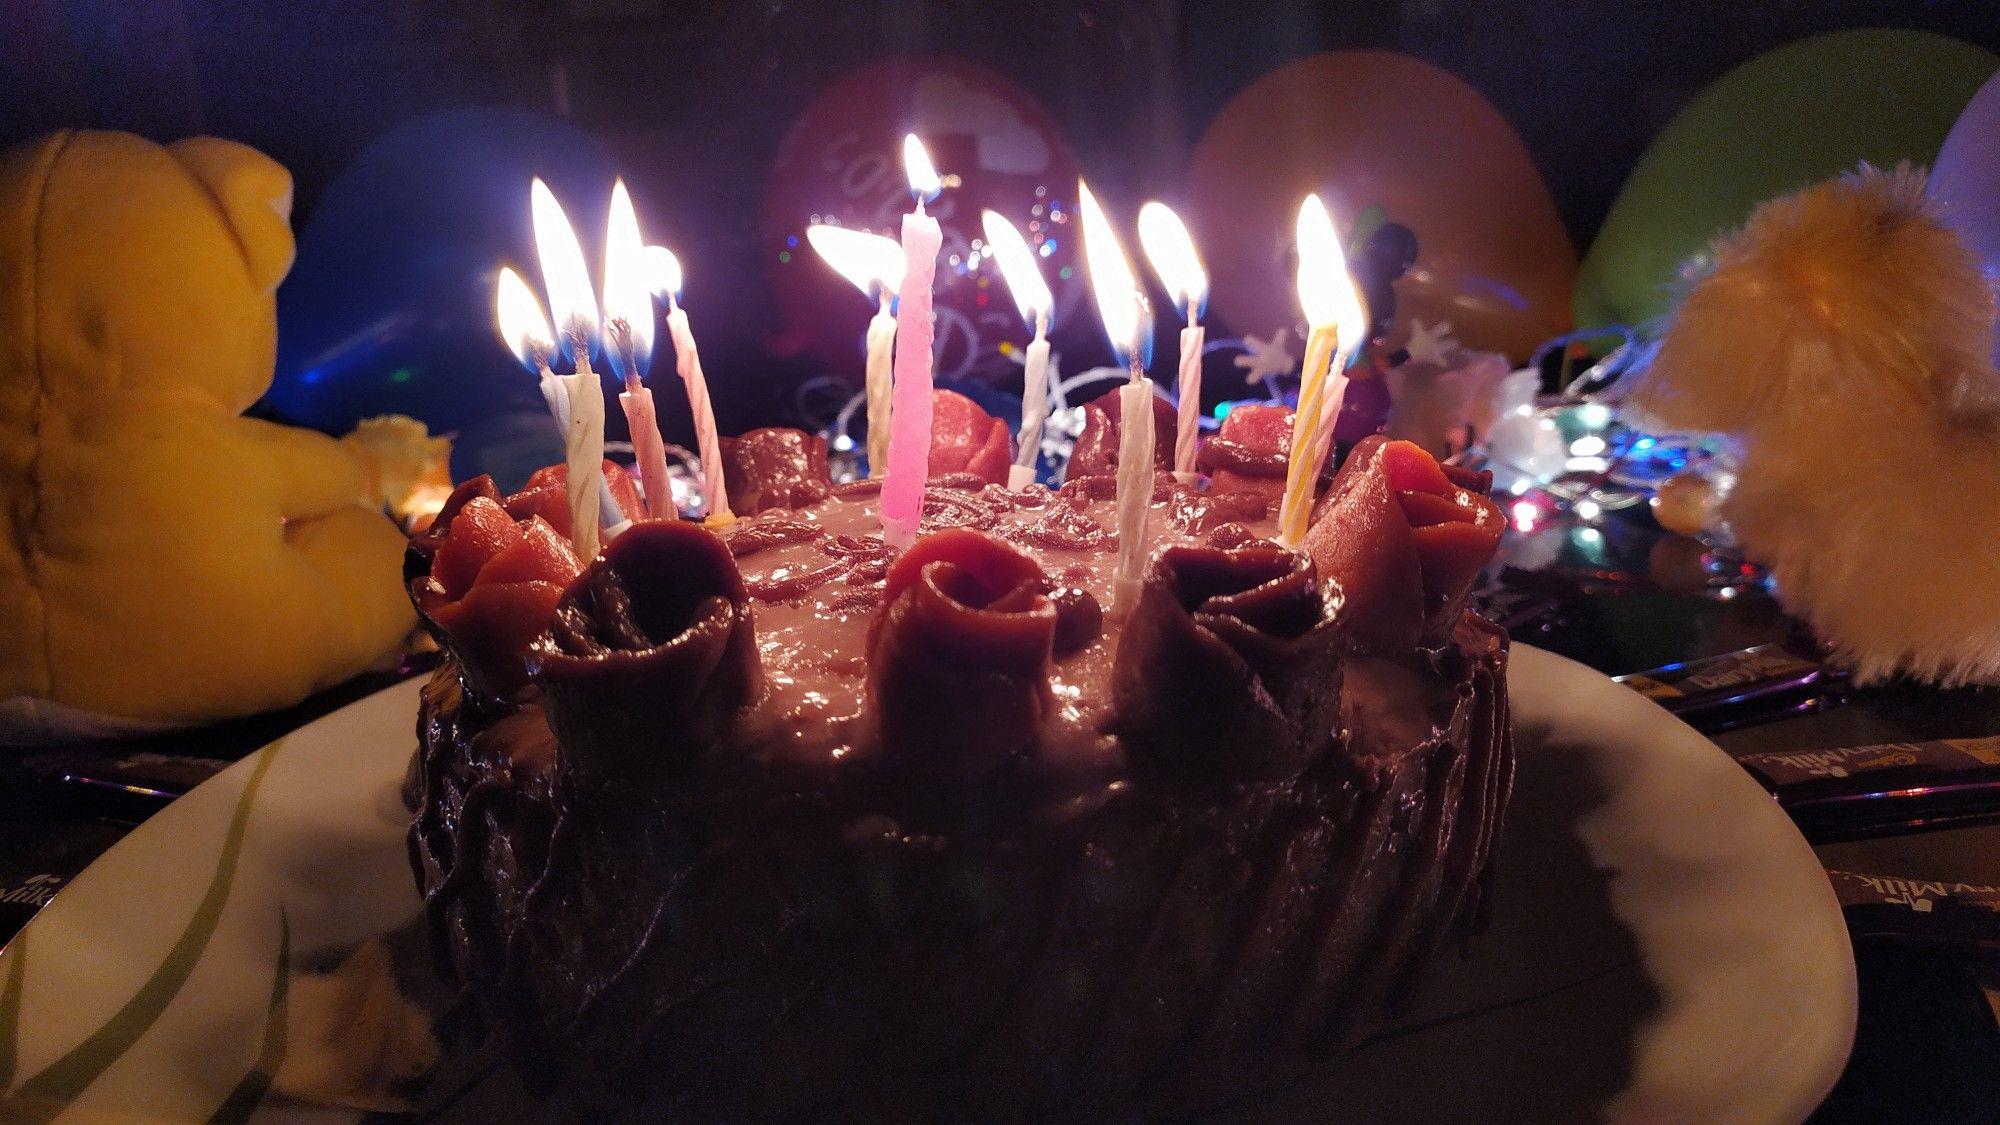 Pin By Satarupa Satapathy On Birthday Cakes And Quotes Birthday Candles Candles Birthday Cake